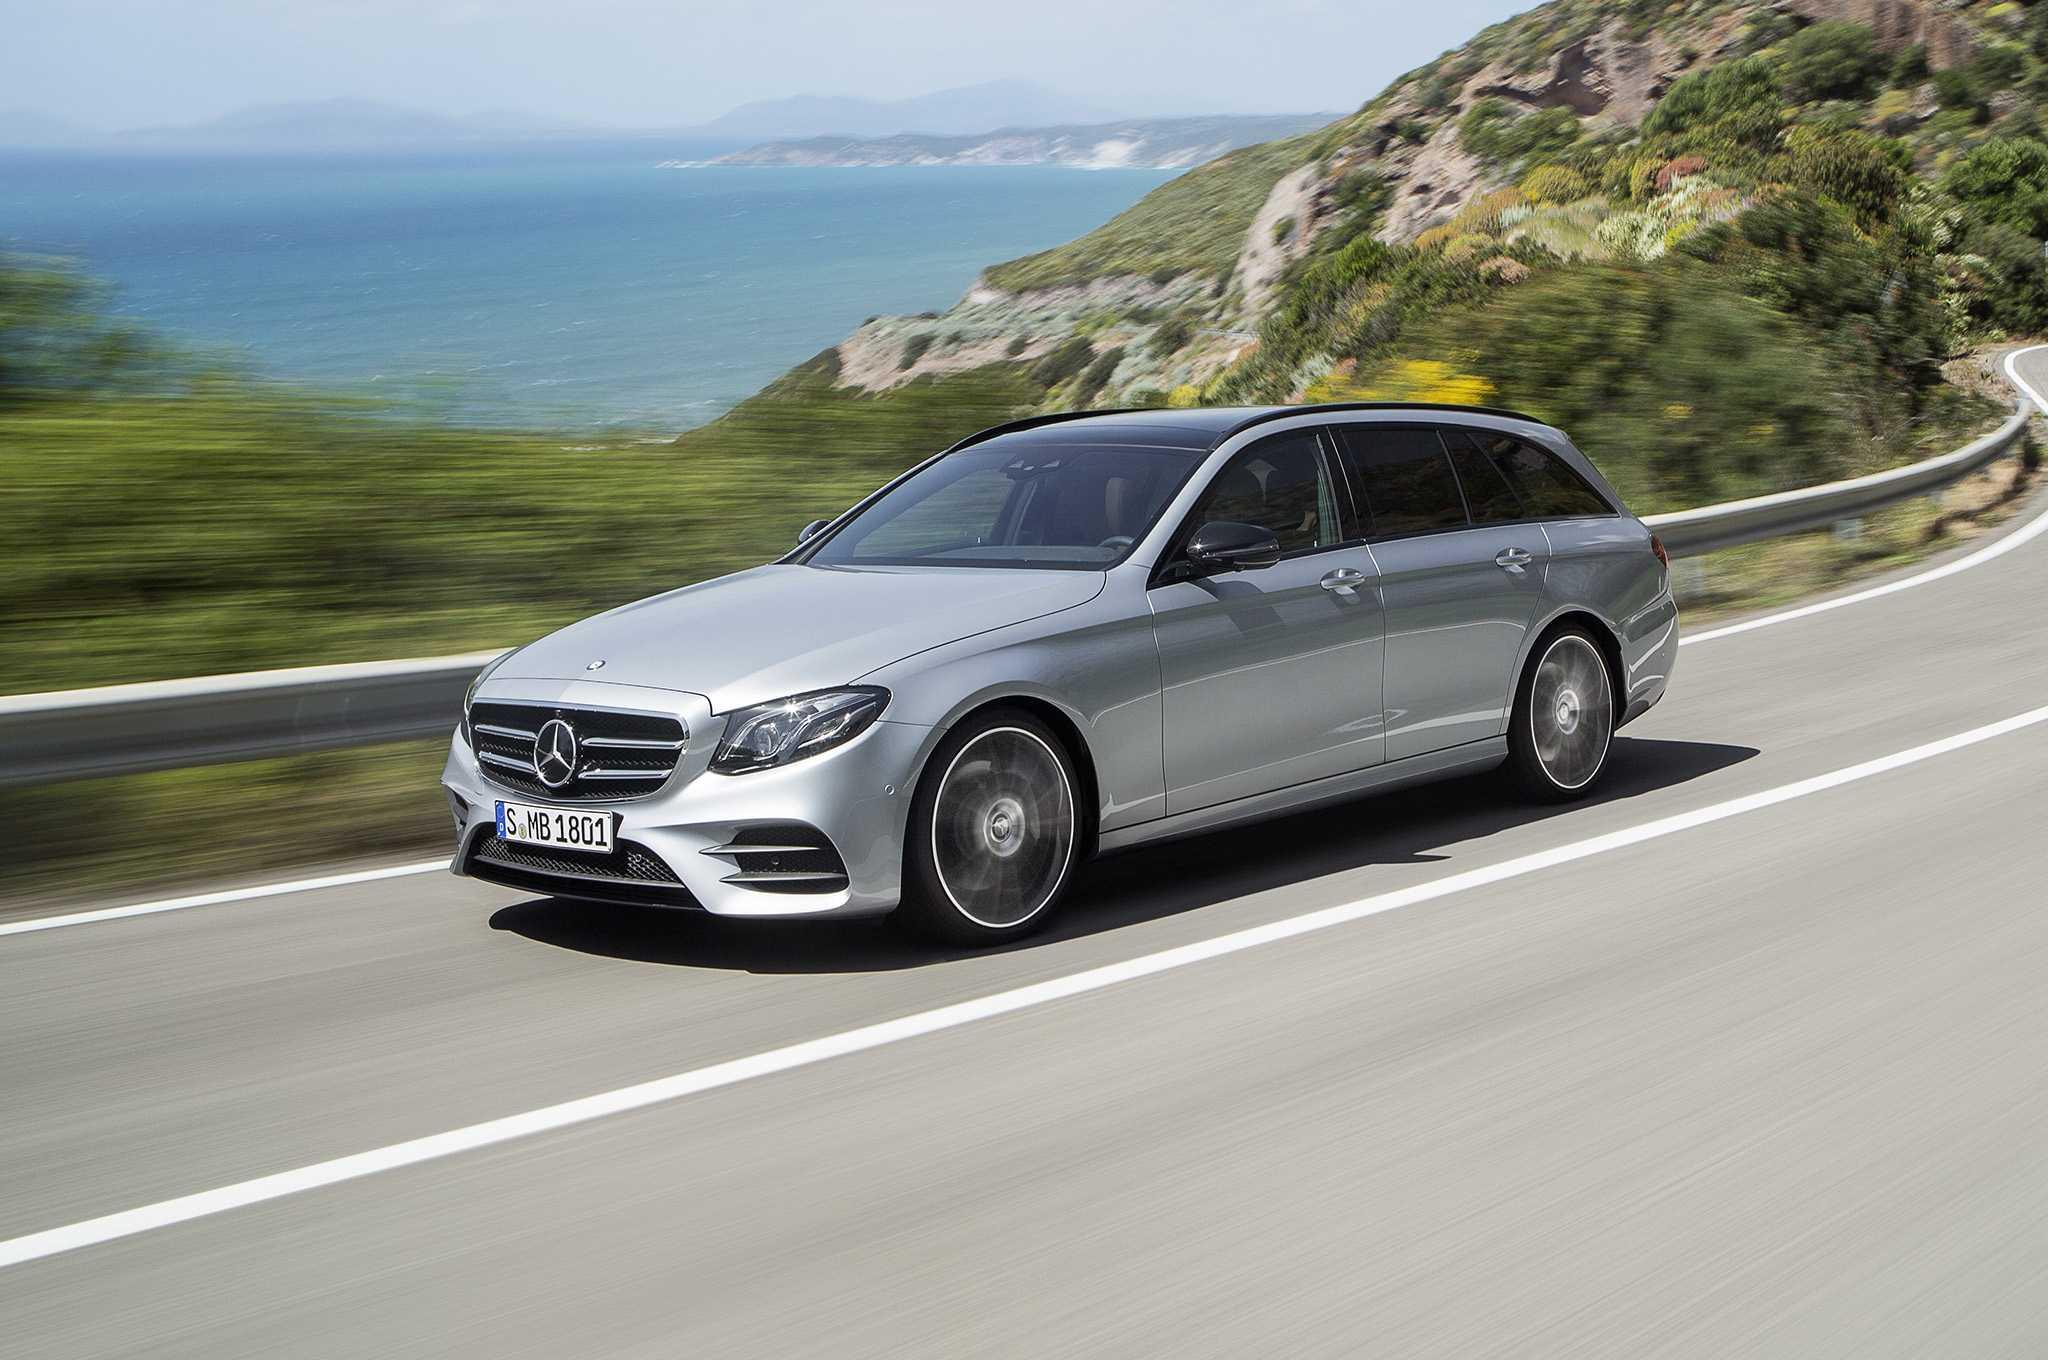 Mercedes Benz E-Class All Terrain SUV is Heading to 2016 Paris Expo